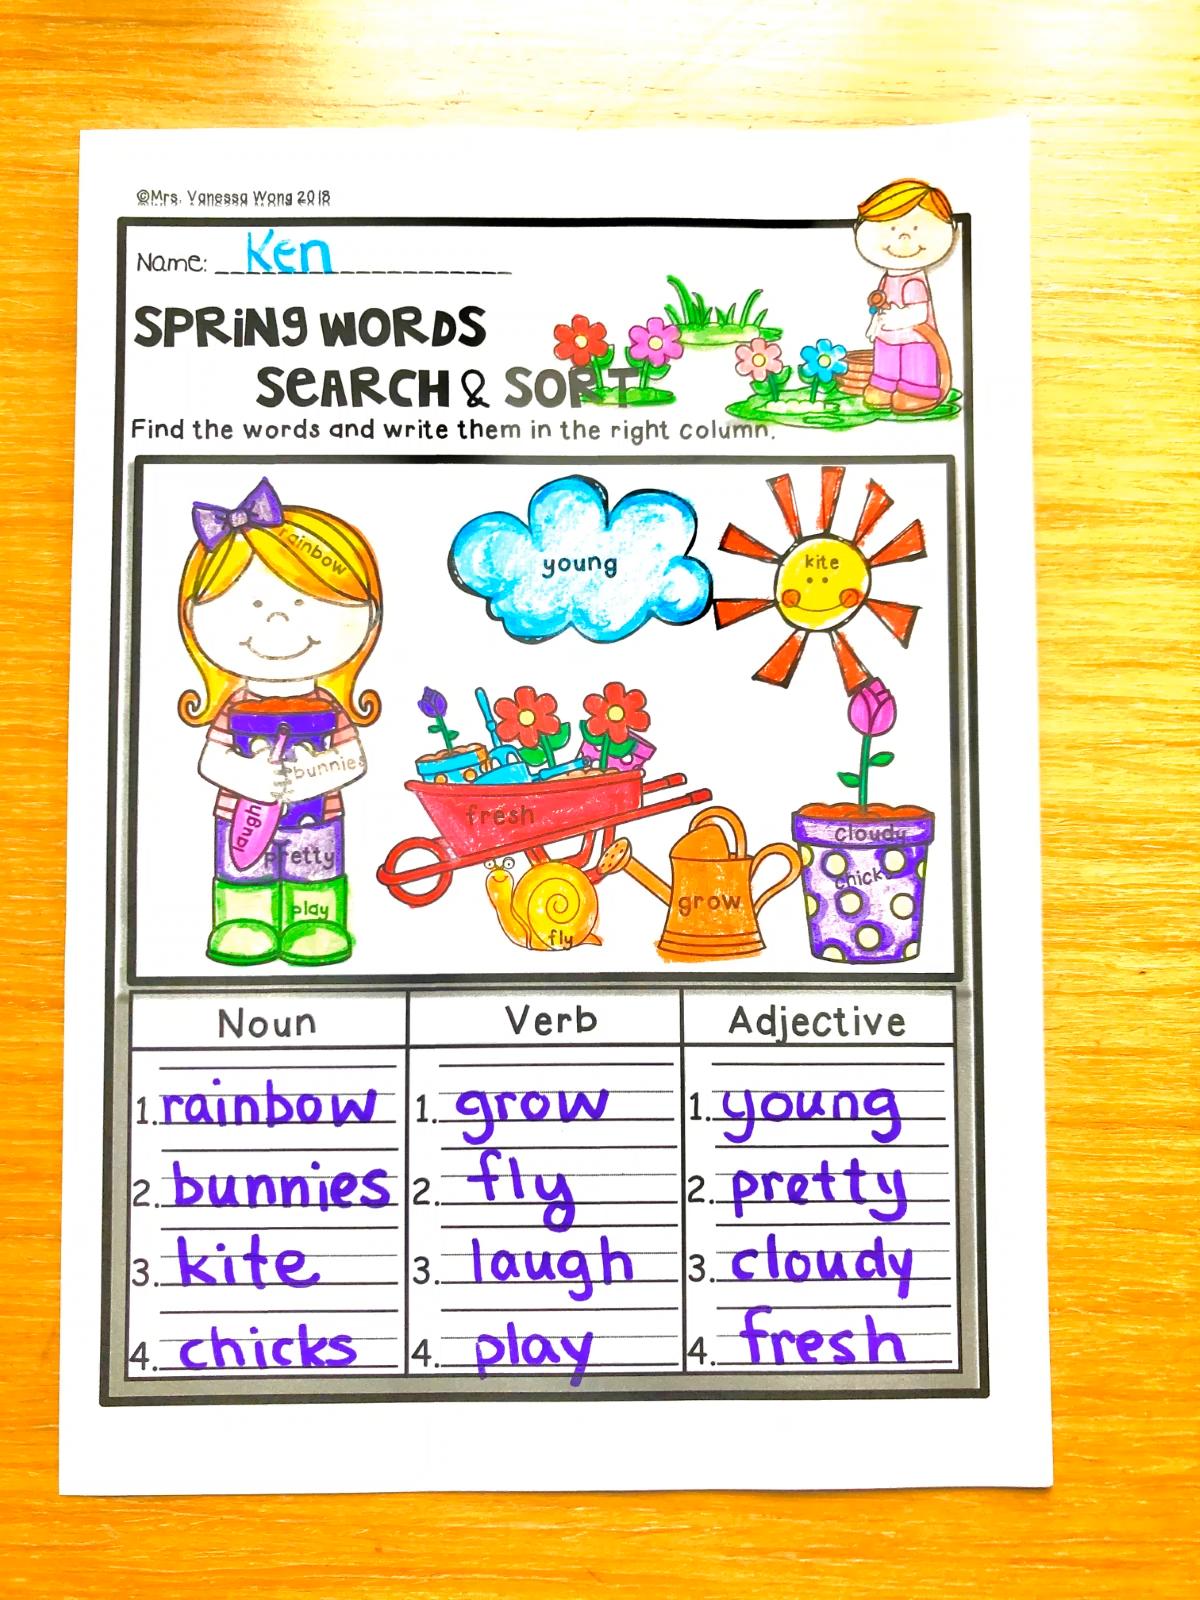 Fall Winter Spring Summer Seasonal Bundle Math Literacy Worksheets First Grade Video In 2021 Spring Math Math Literacy Literacy [ 1600 x 1200 Pixel ]